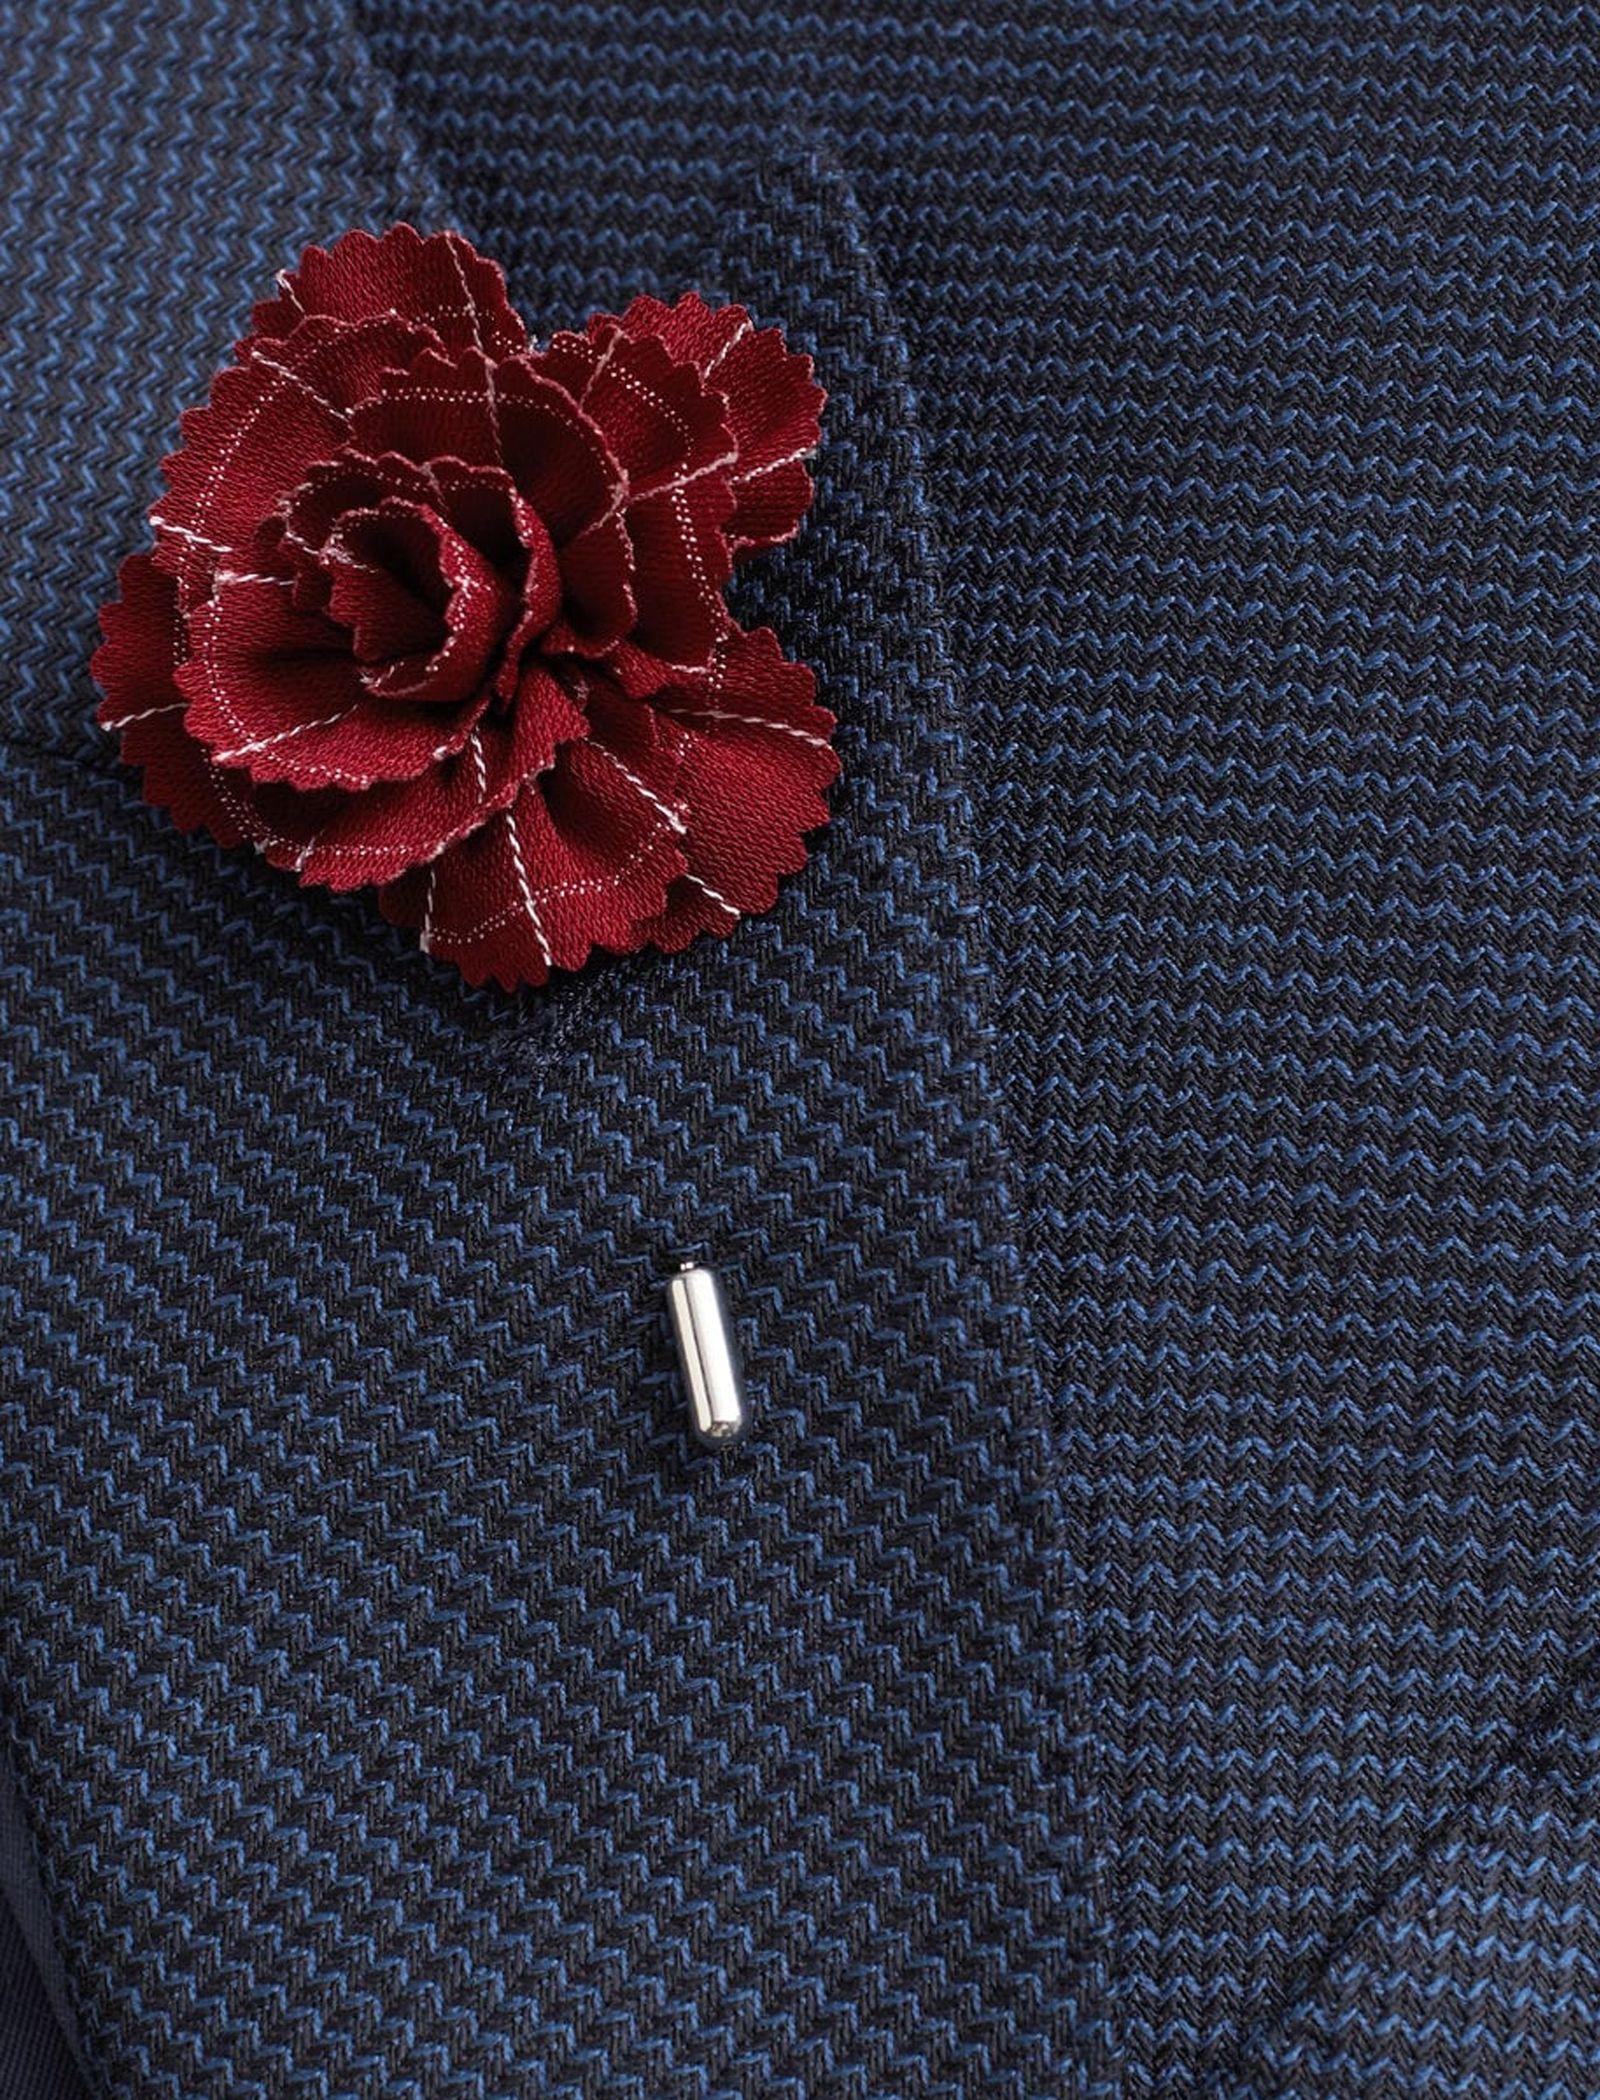 سنجاق روی کت مردانه - مانگو - زرشکي - 3